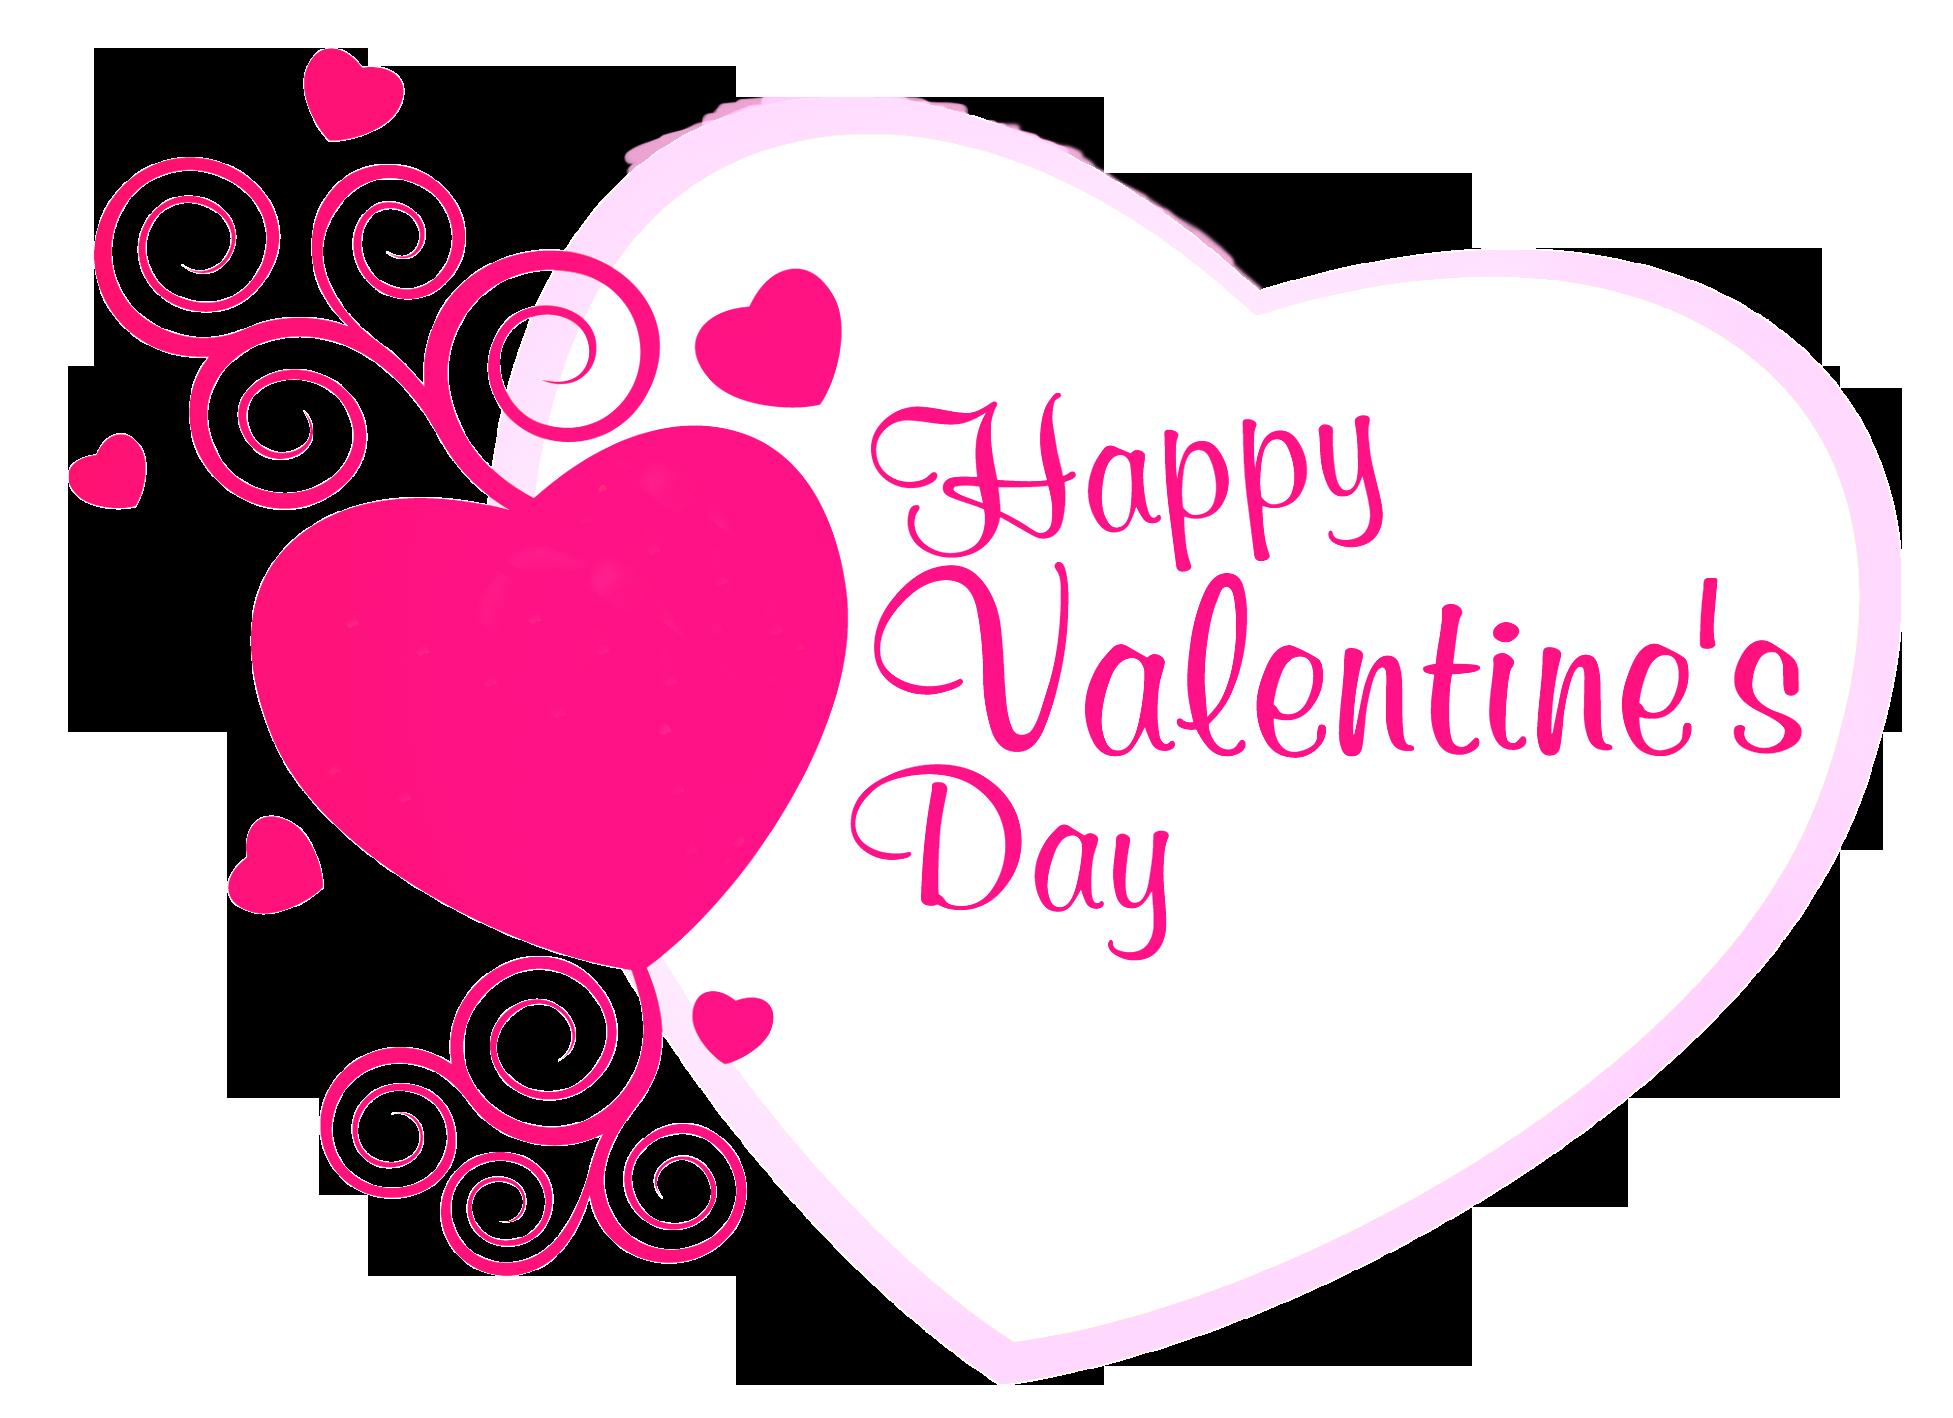 Valentines day hearts happy .-Valentines day hearts happy .-15